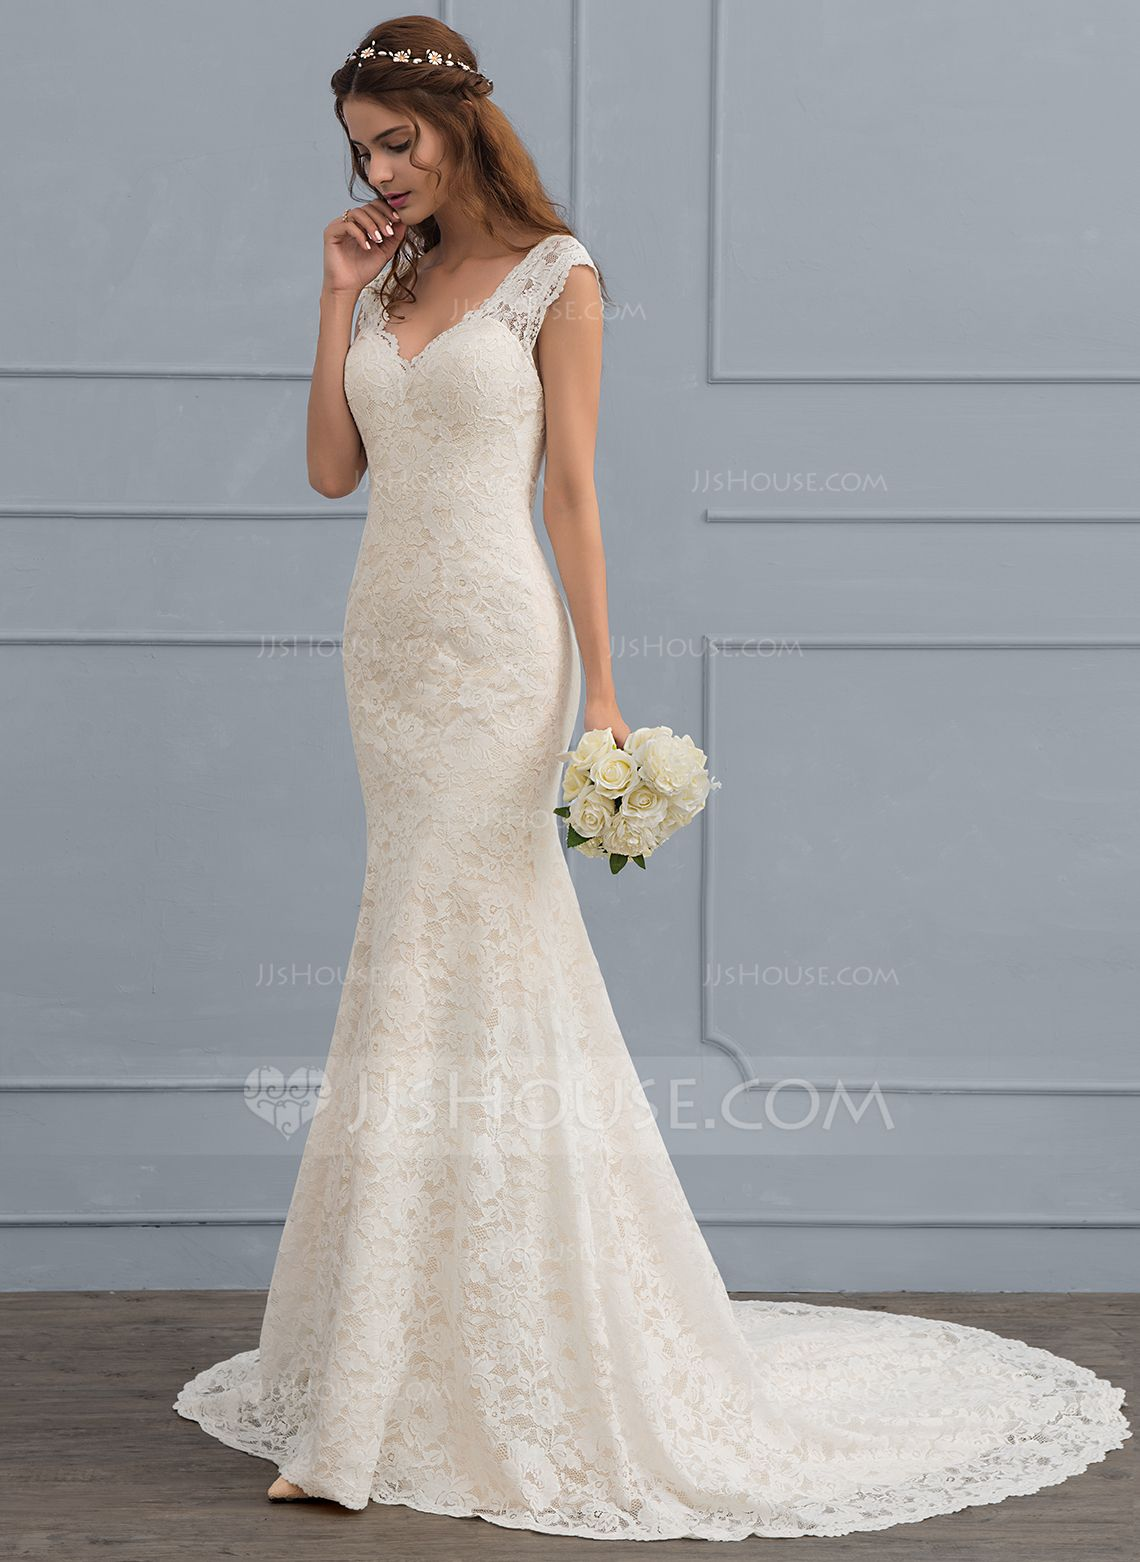 Us 265 00 Trumpet Mermaid V Neck Court Train Lace Wedding Dress Jj S House Wedding Dresses Lace Wedding Dress Patterns Wedding Dresses [ 1562 x 1140 Pixel ]